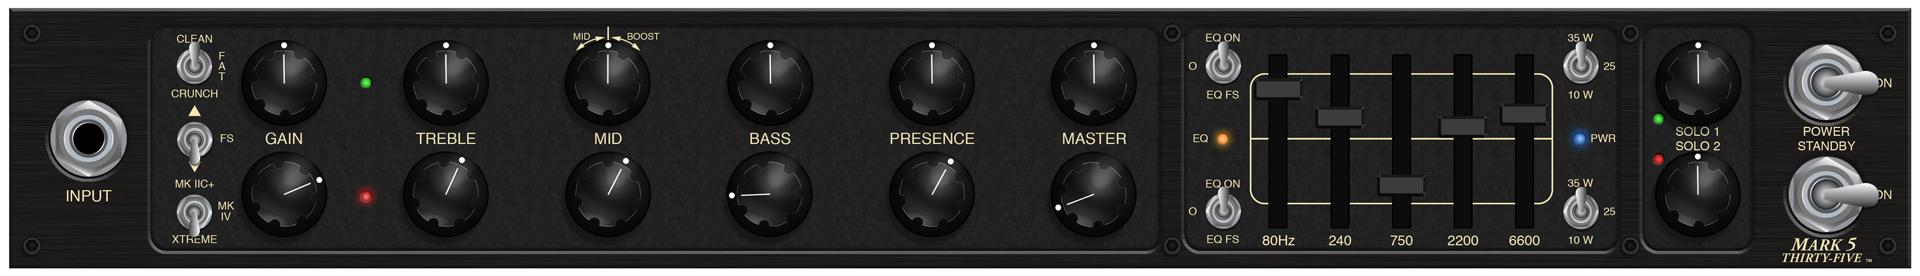 Mark Five: 35 Rhythm Settings